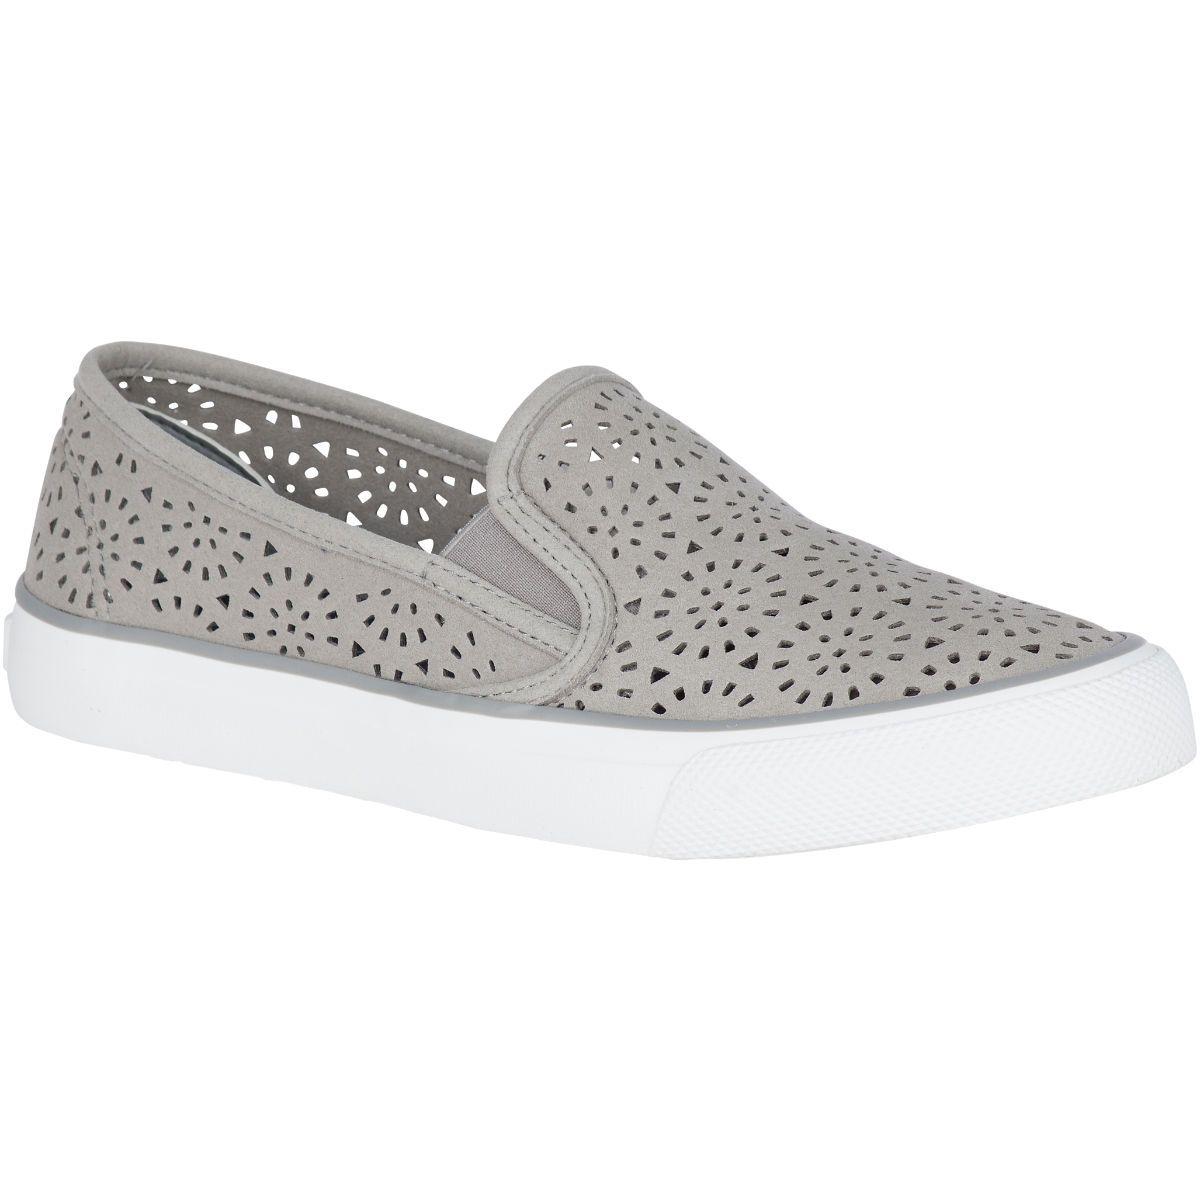 Women's Seaside Perforated Sneaker Grey | Work shoes women